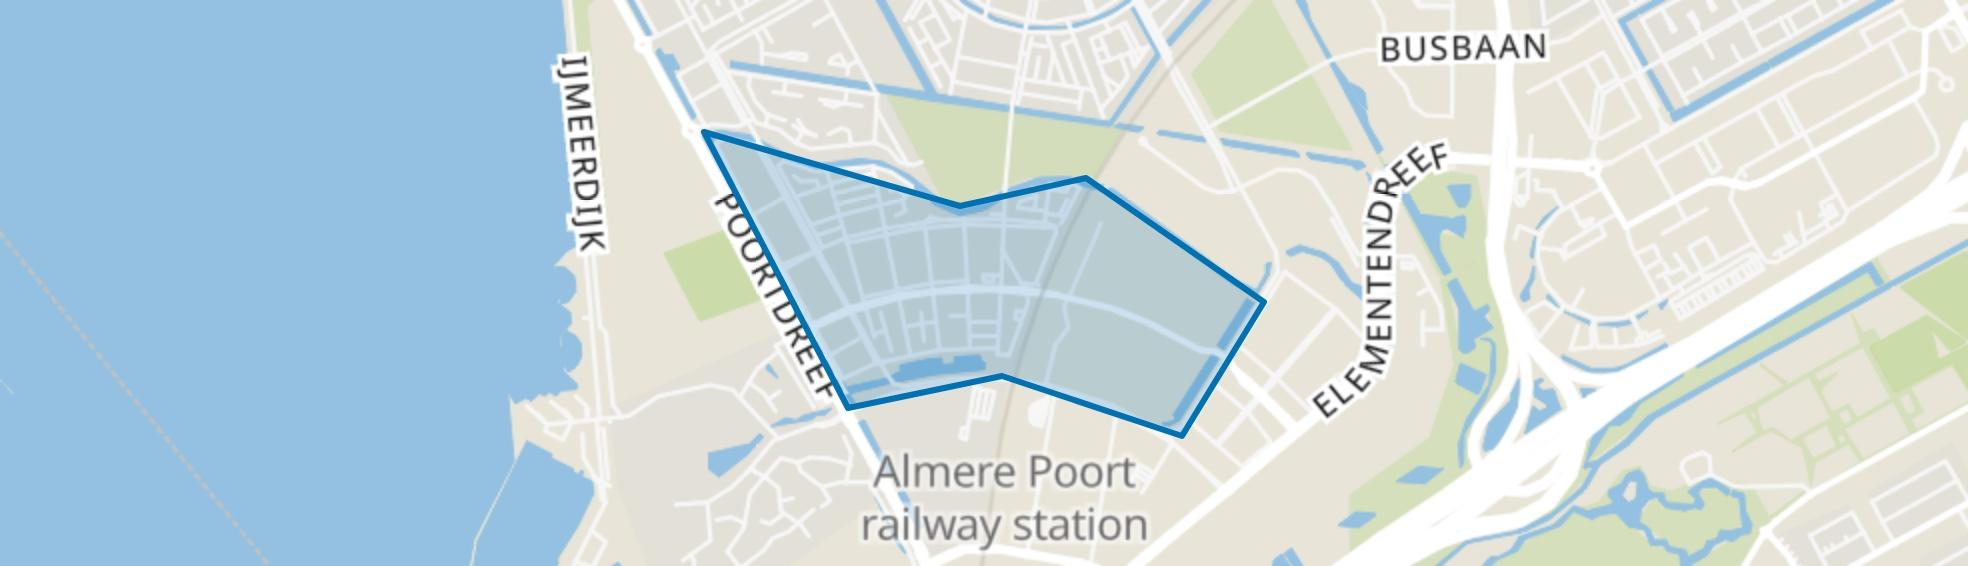 Europakwartier, Almere map